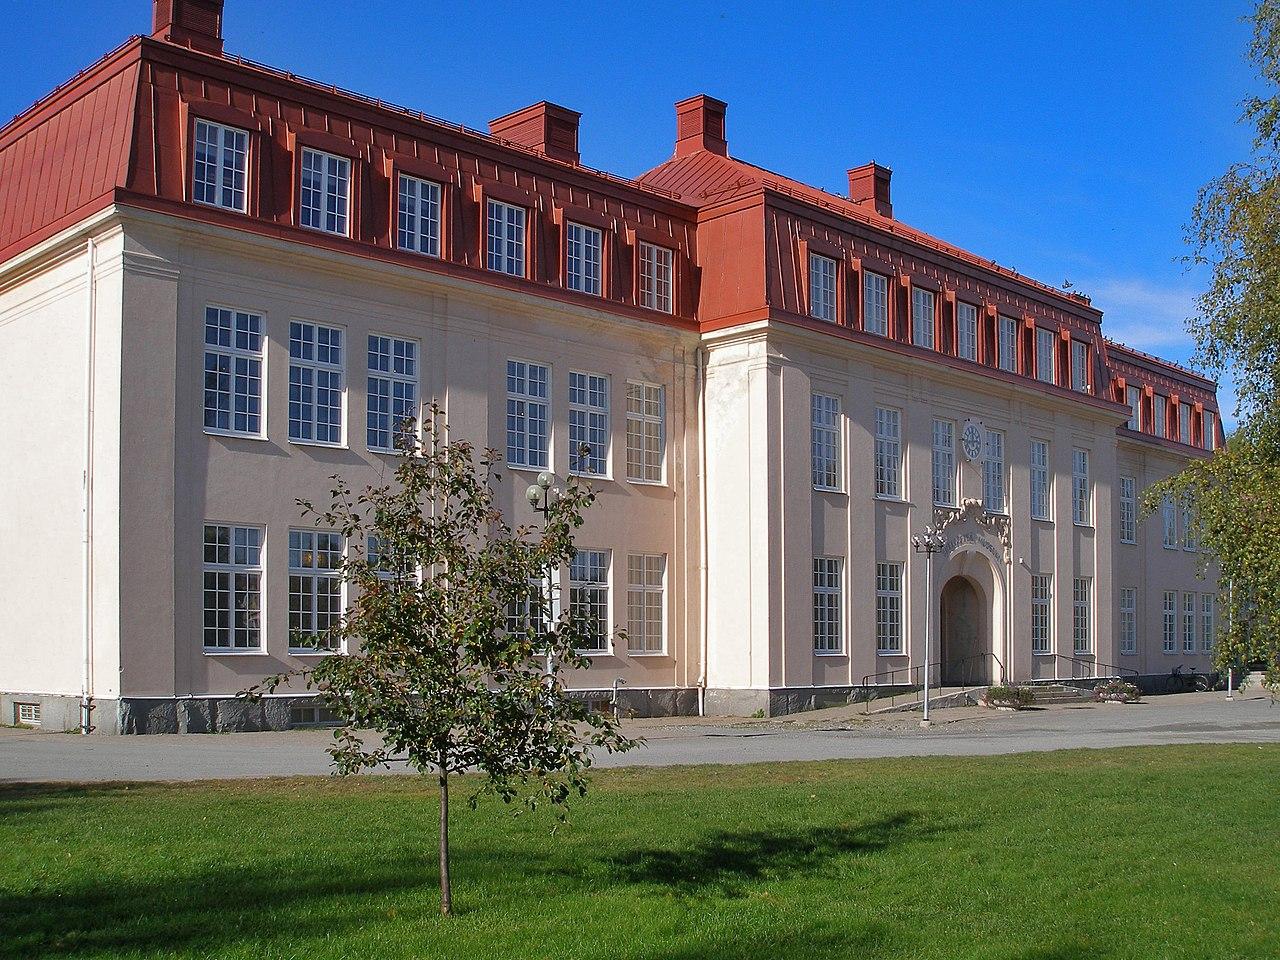 Skellefteå museum. Foto. Jlundqvi